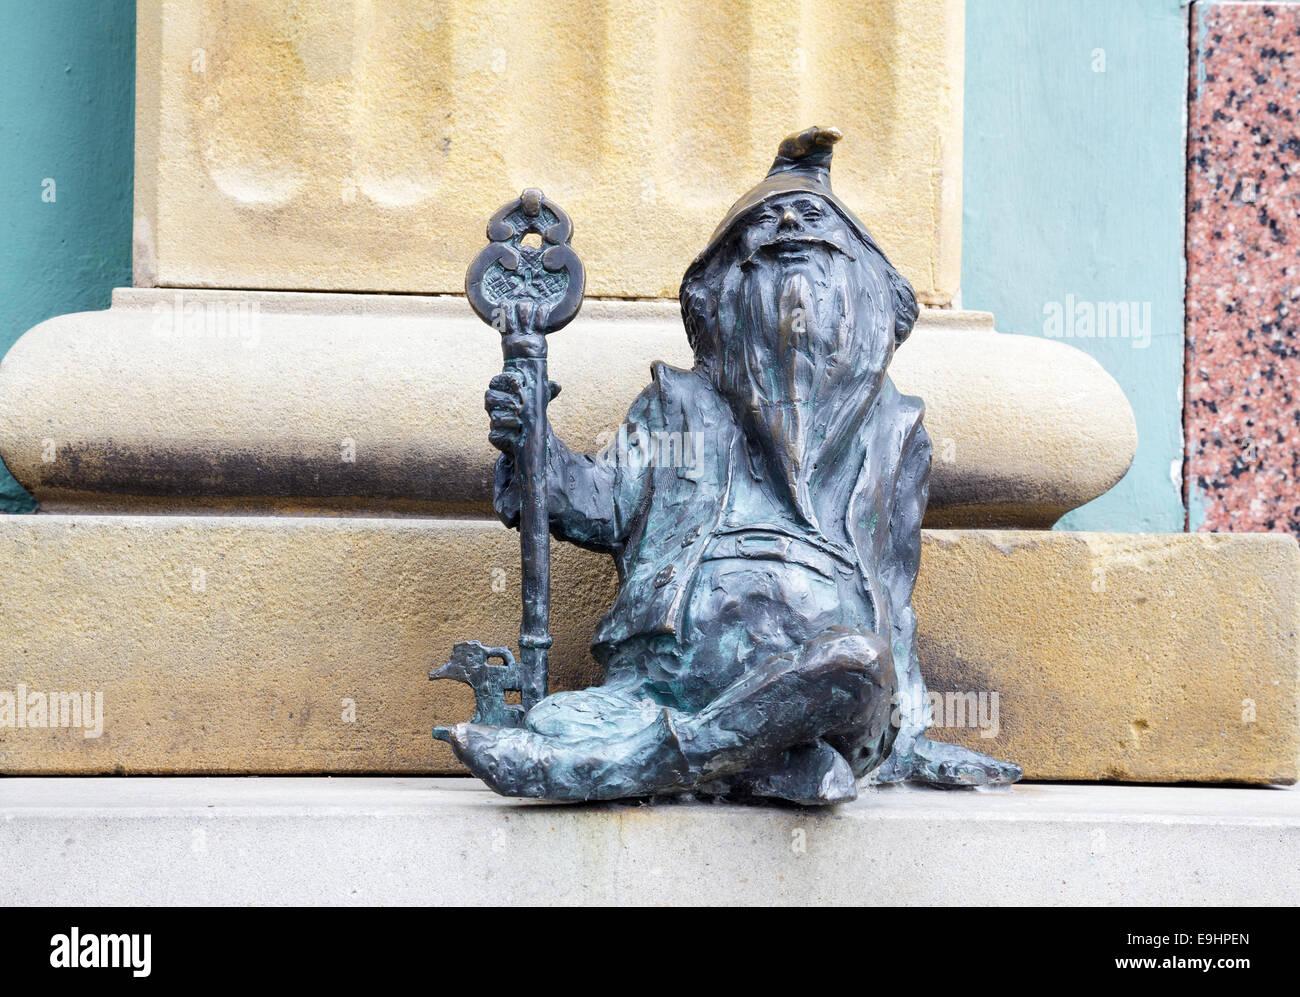 The gnomes of Wroclaw, Klucznik, Steward, Poland Stock Photo